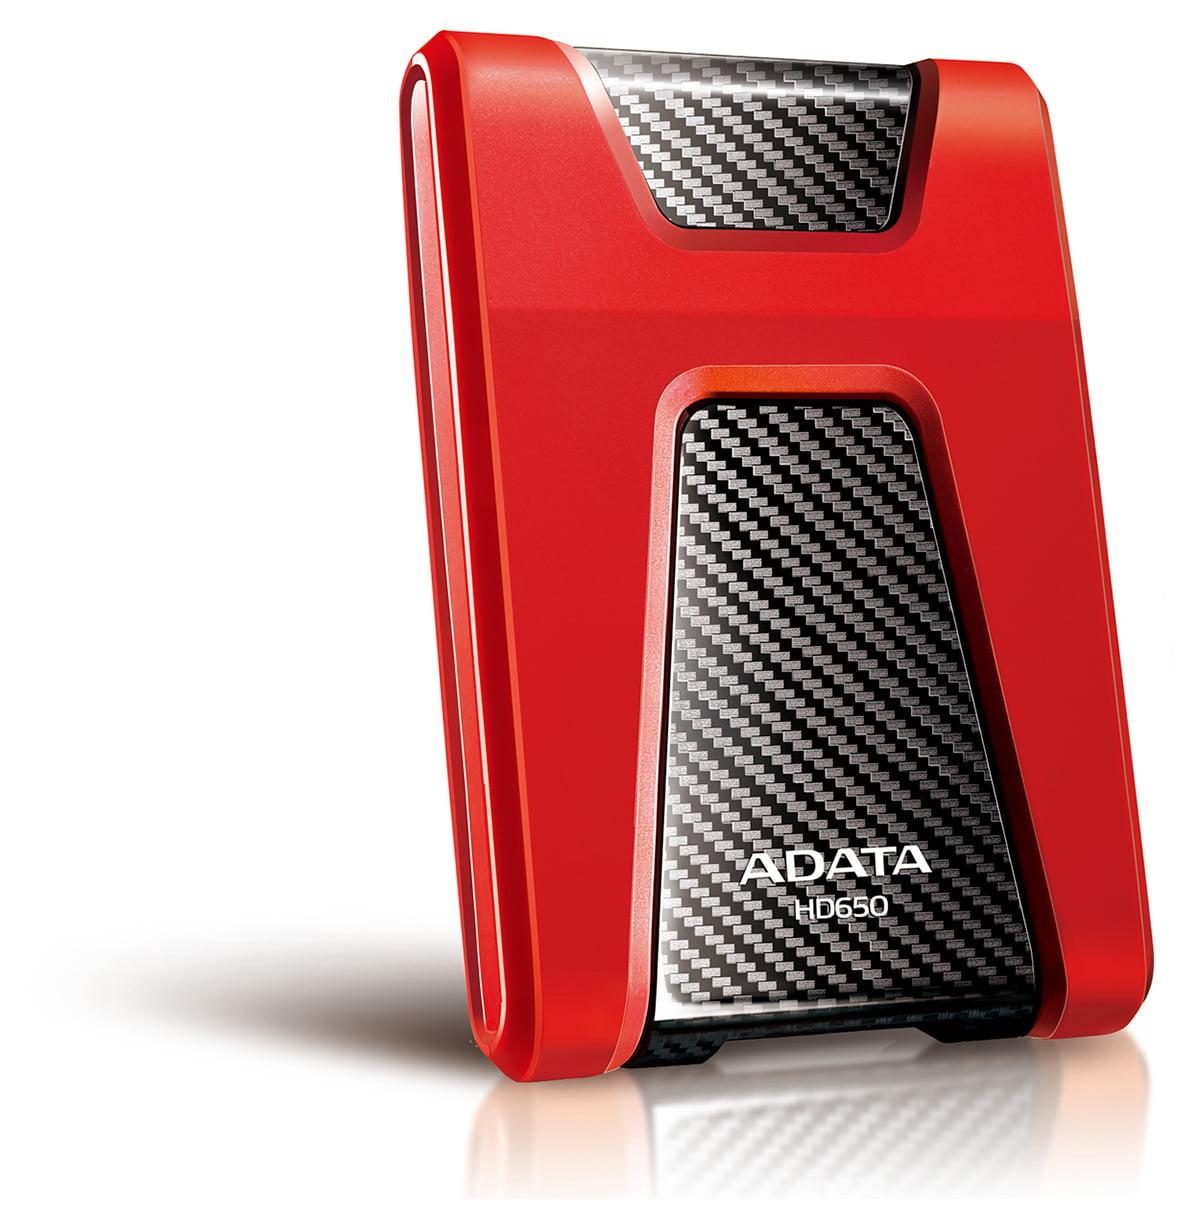 1TB AData Red/Black HD650 DashDrive USB3.0 Portable Hard Drive